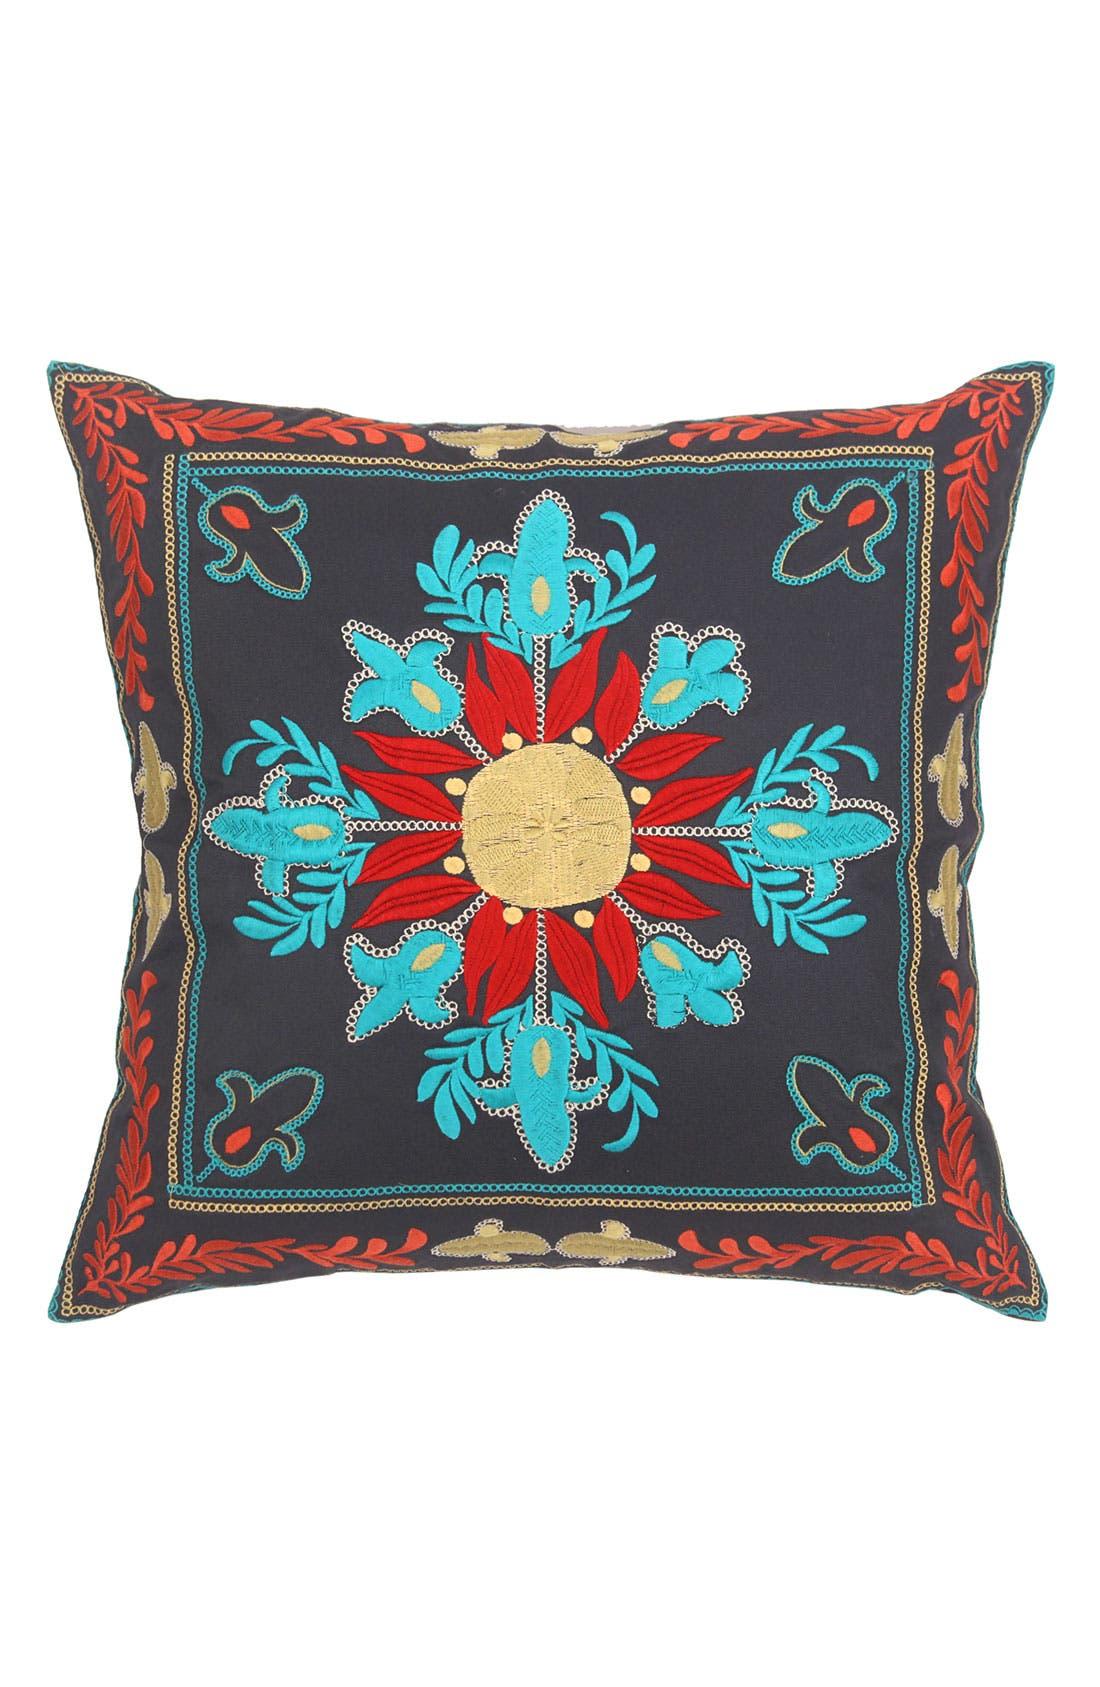 Main Image - Blissliving Home 'Samsara' Pillow